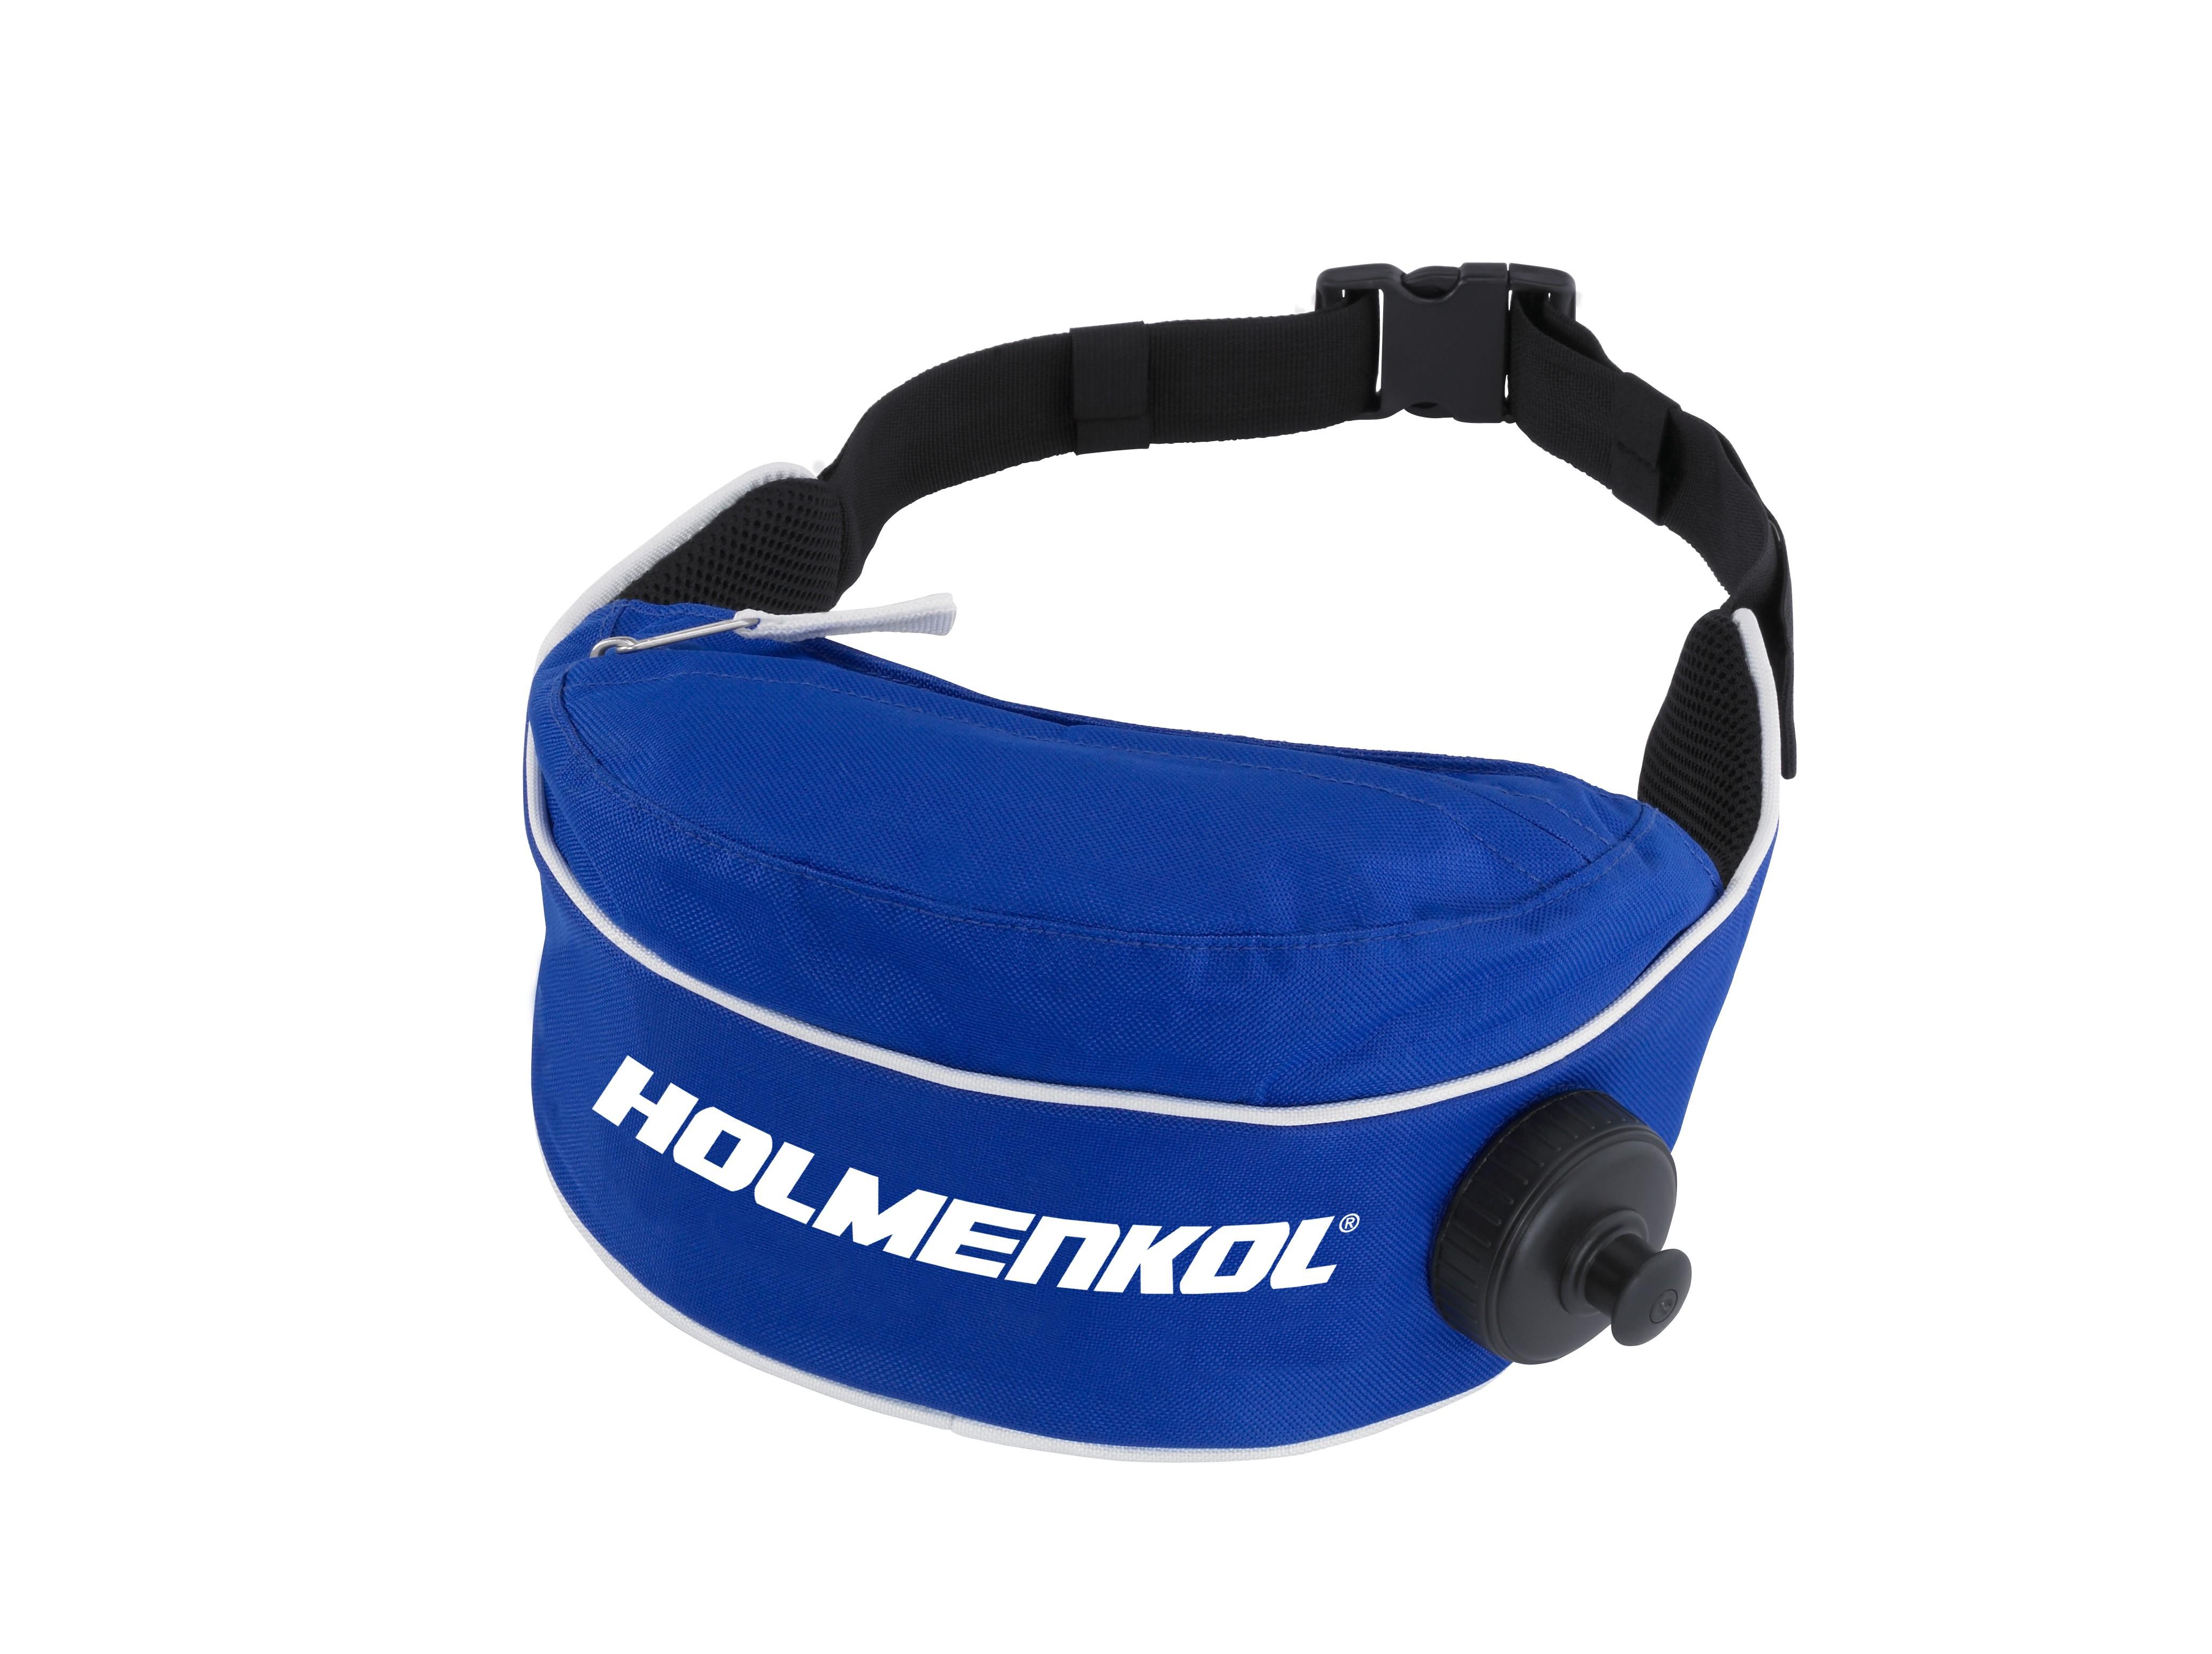 Holmenkol Racing bottle bag, 1000ml